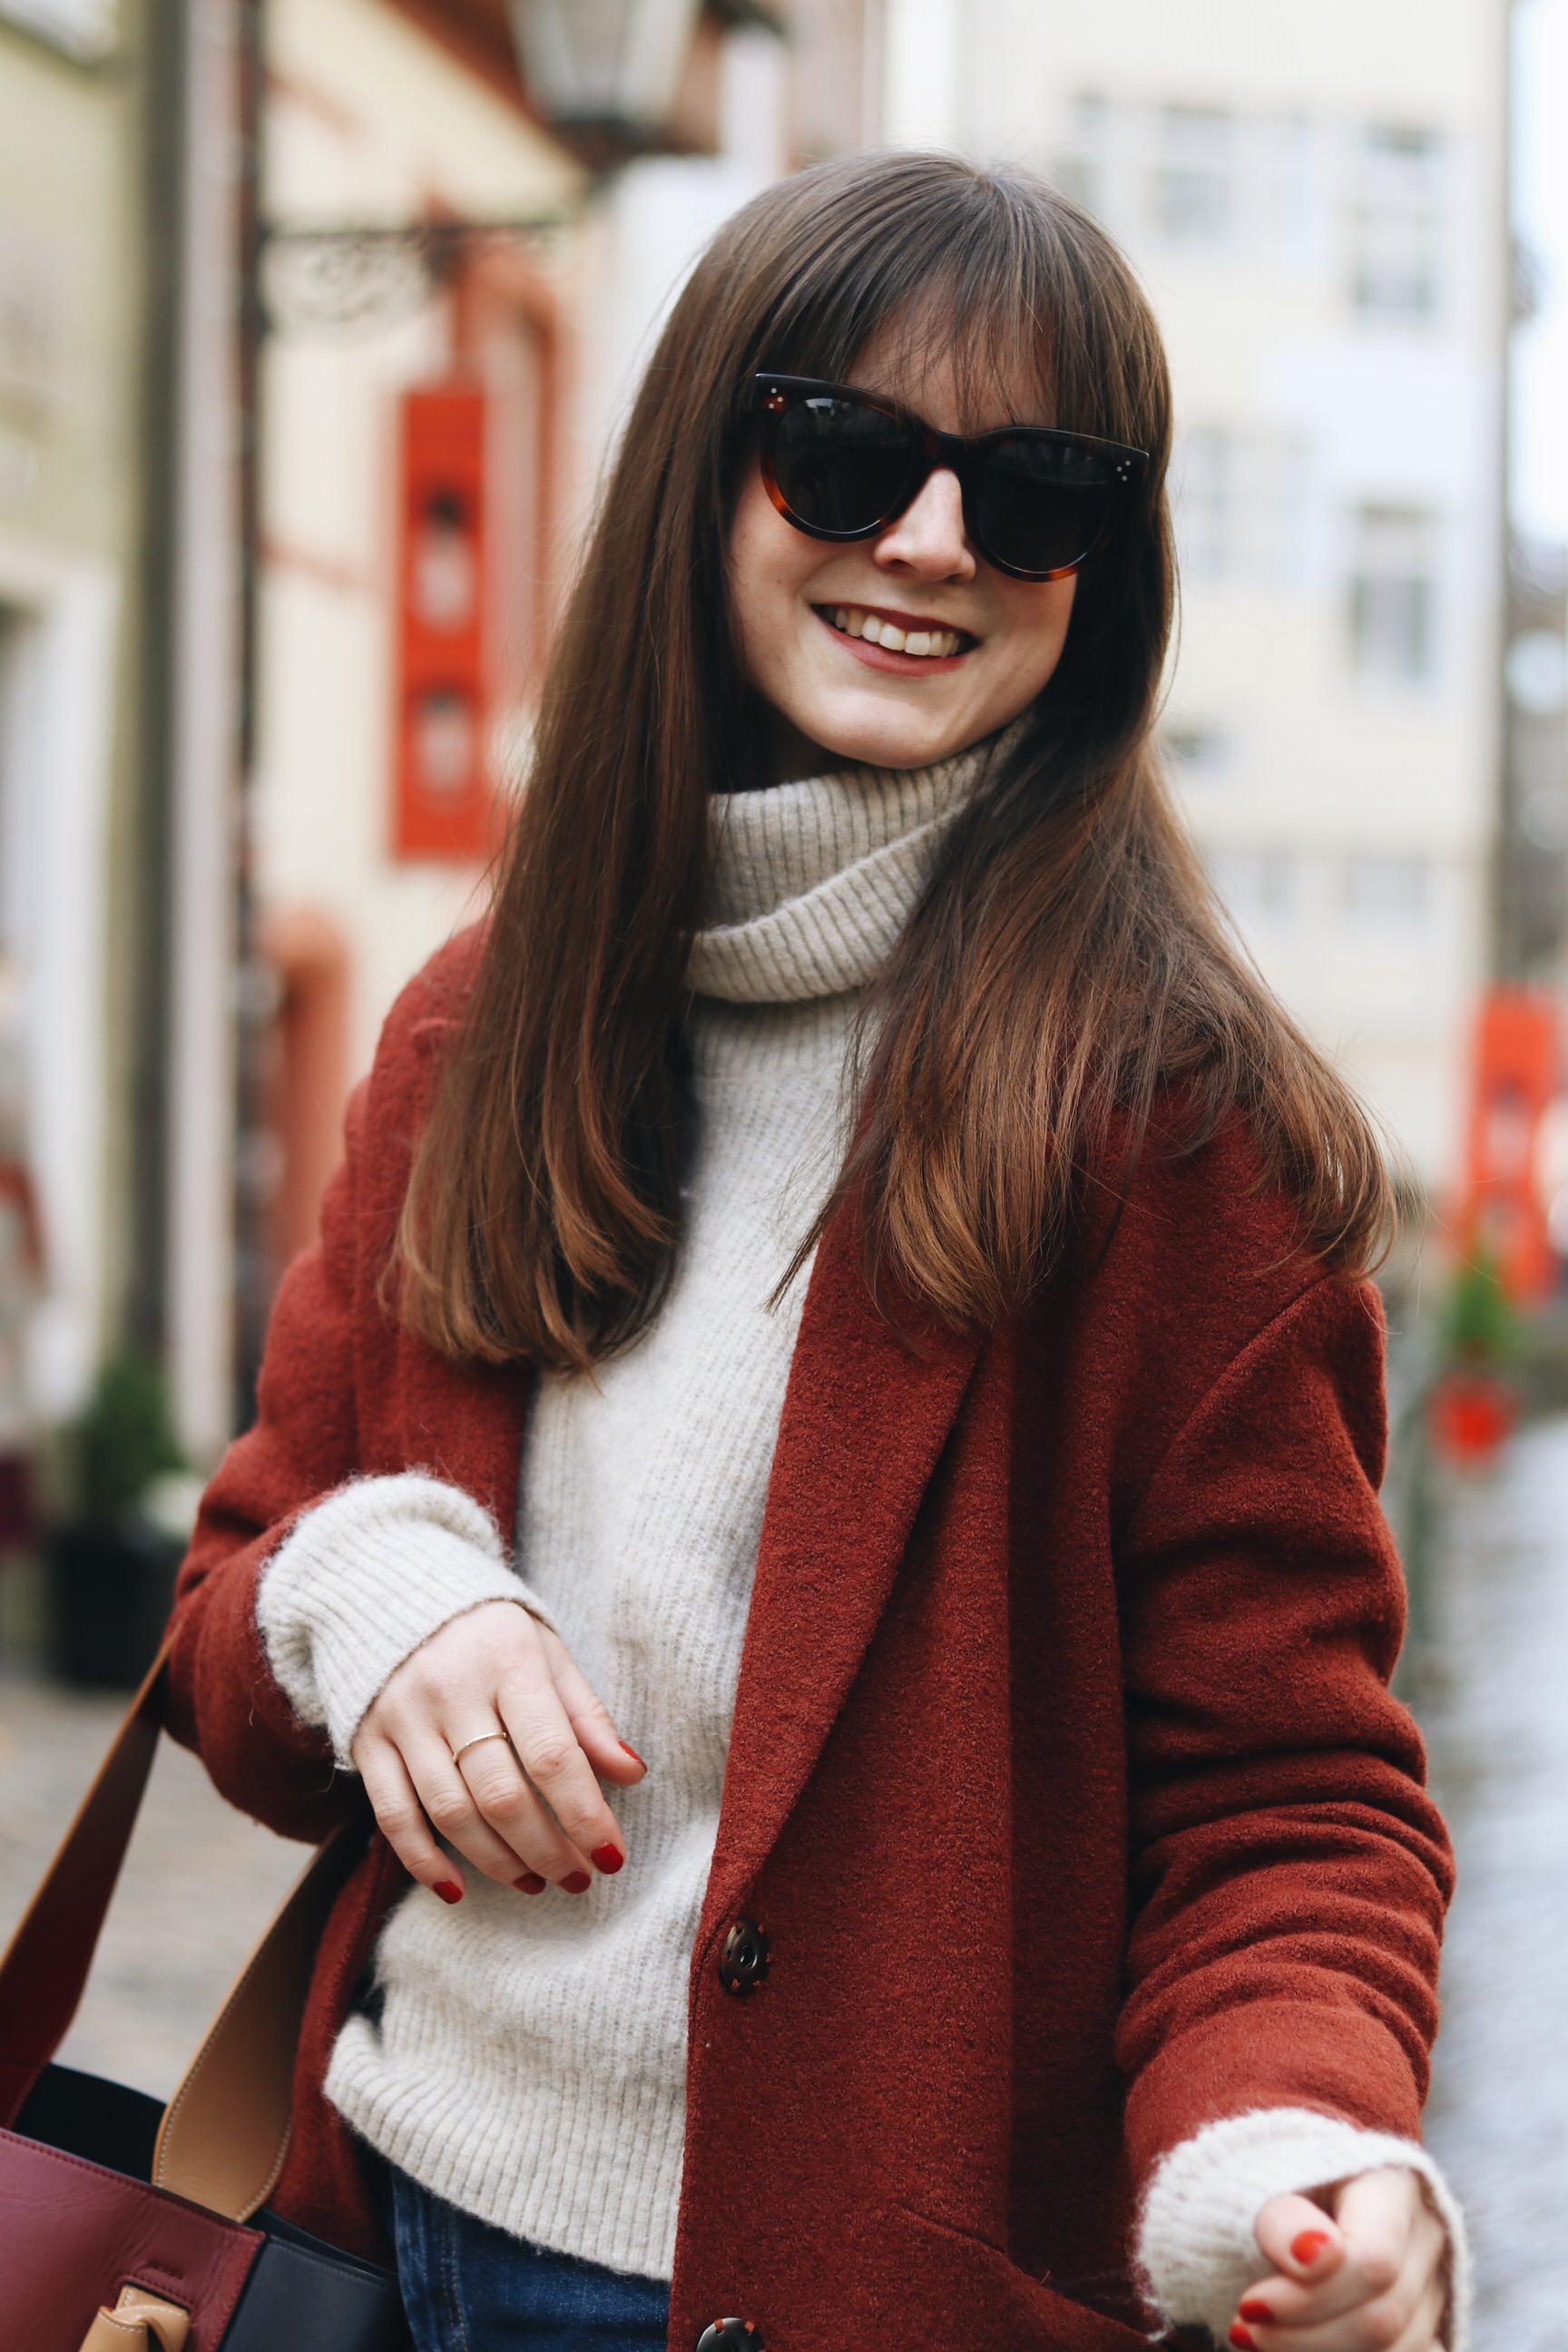 Neele Modebloggerin Freiburg Top 10 Deutschland Modeblog Winter Outfit Streetstyle Wintermantel